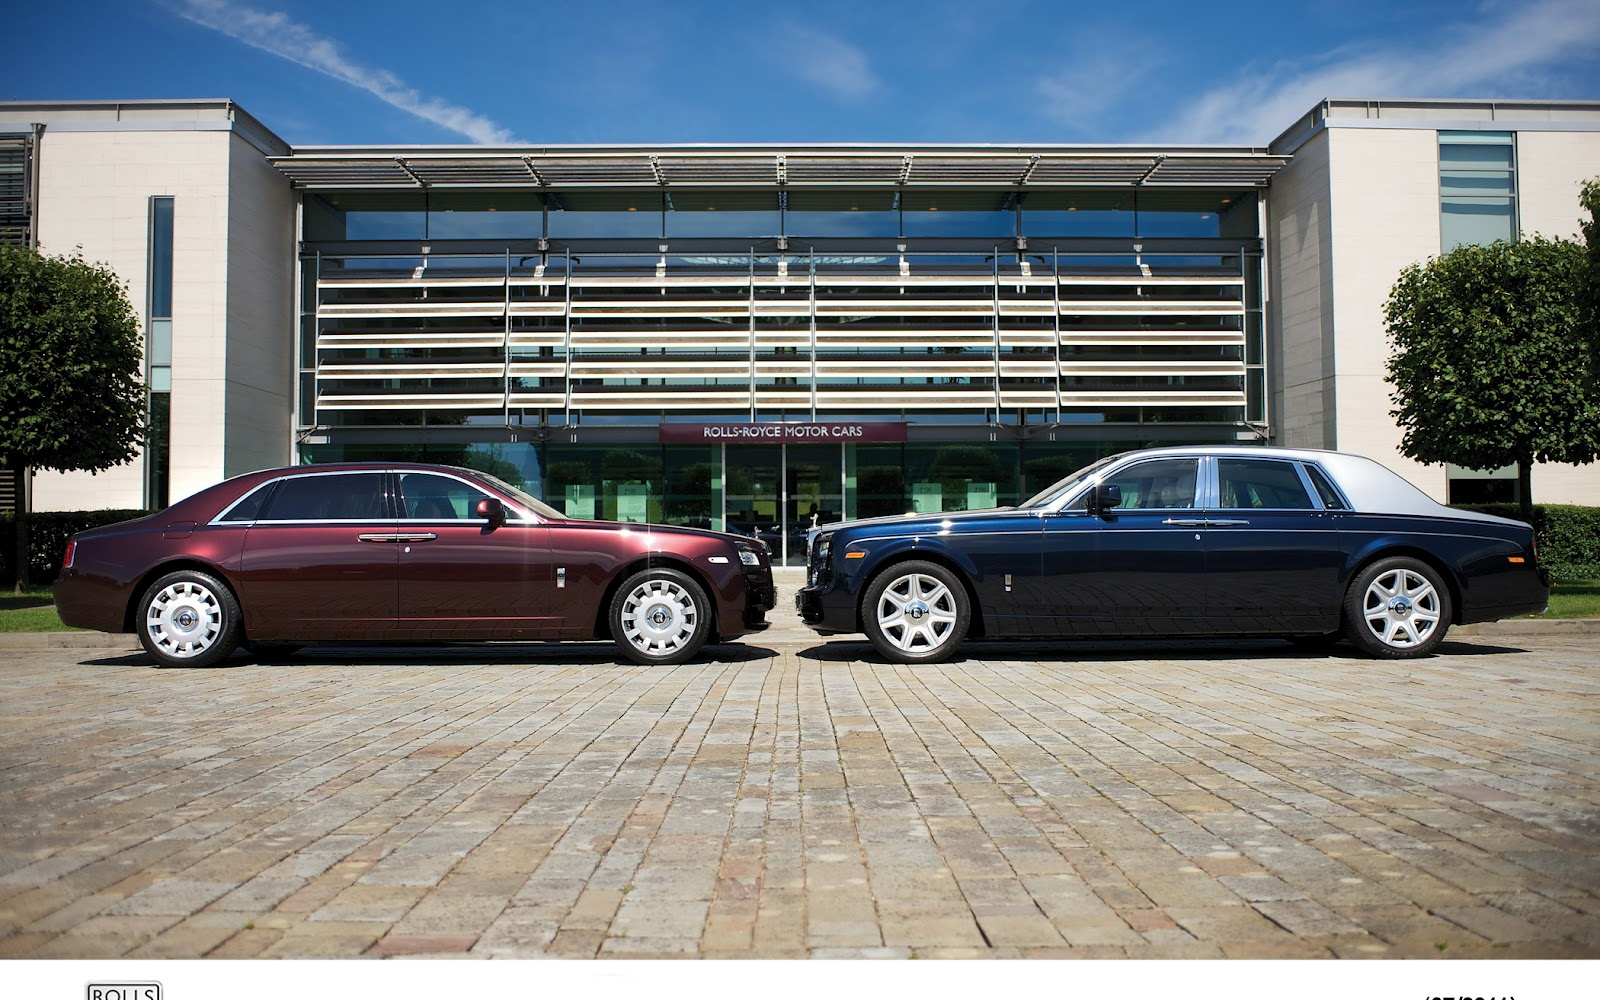 Rolls Royce Ghost vs. Phantom